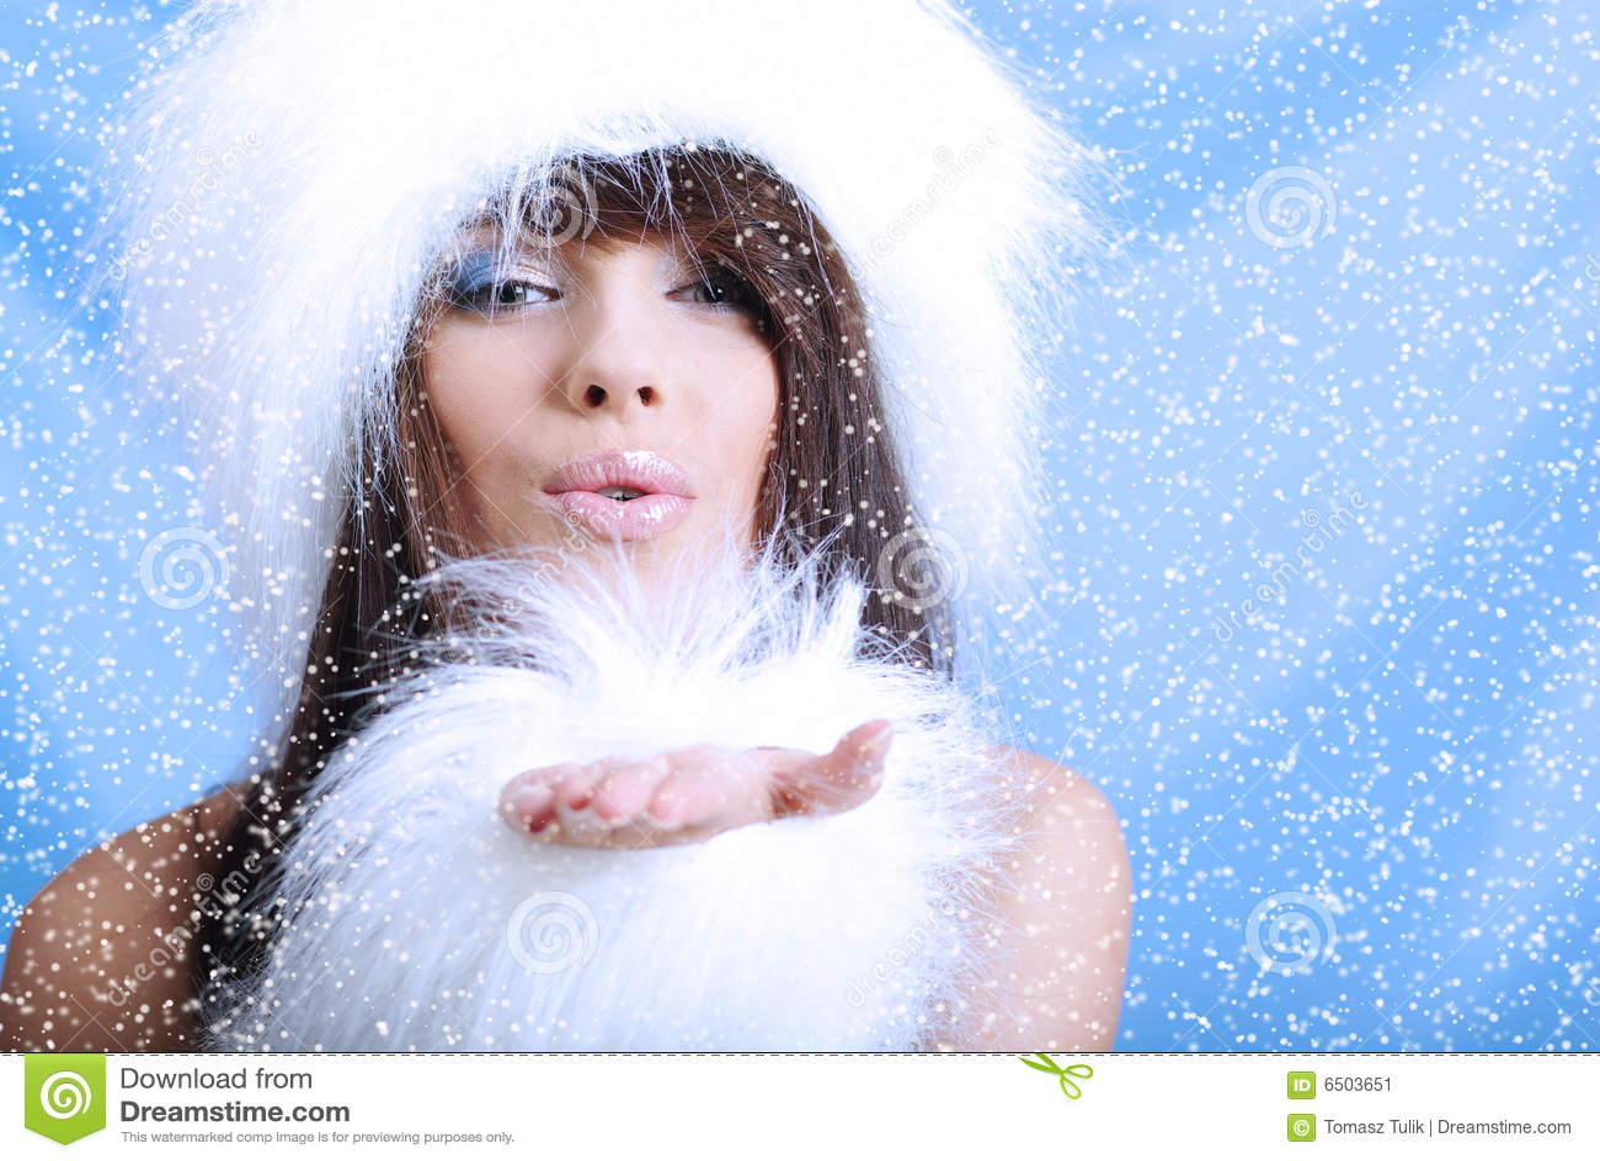 Фото макияж снегурочки